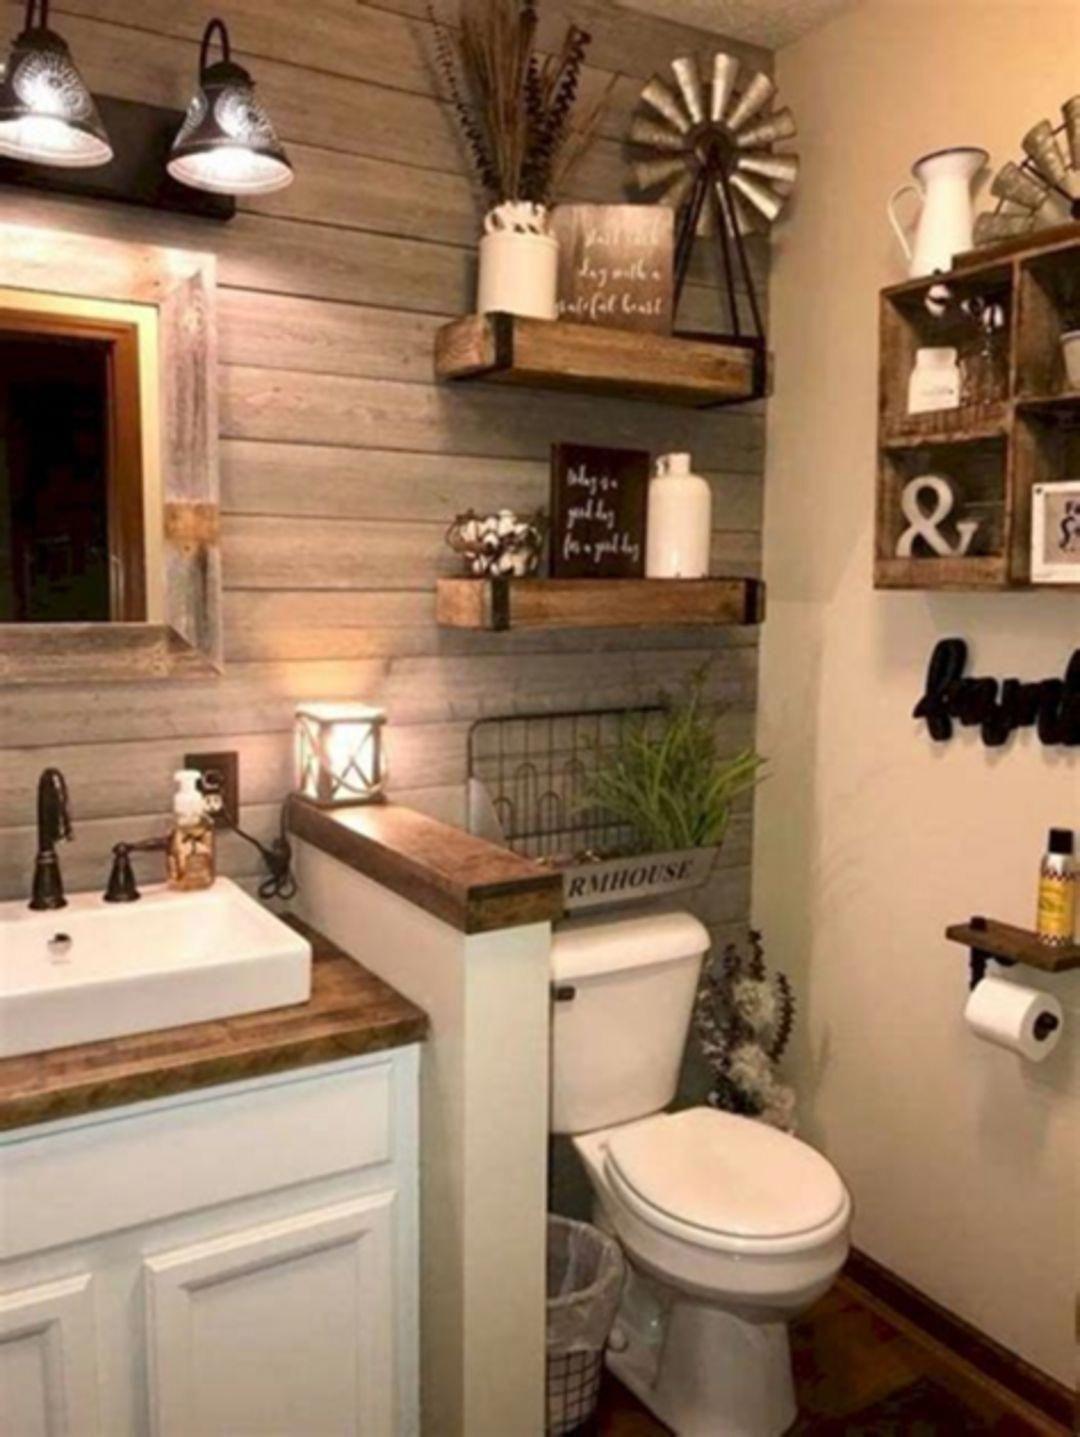 Bathroomdecoridea decor bathroom in pinterest decor diy